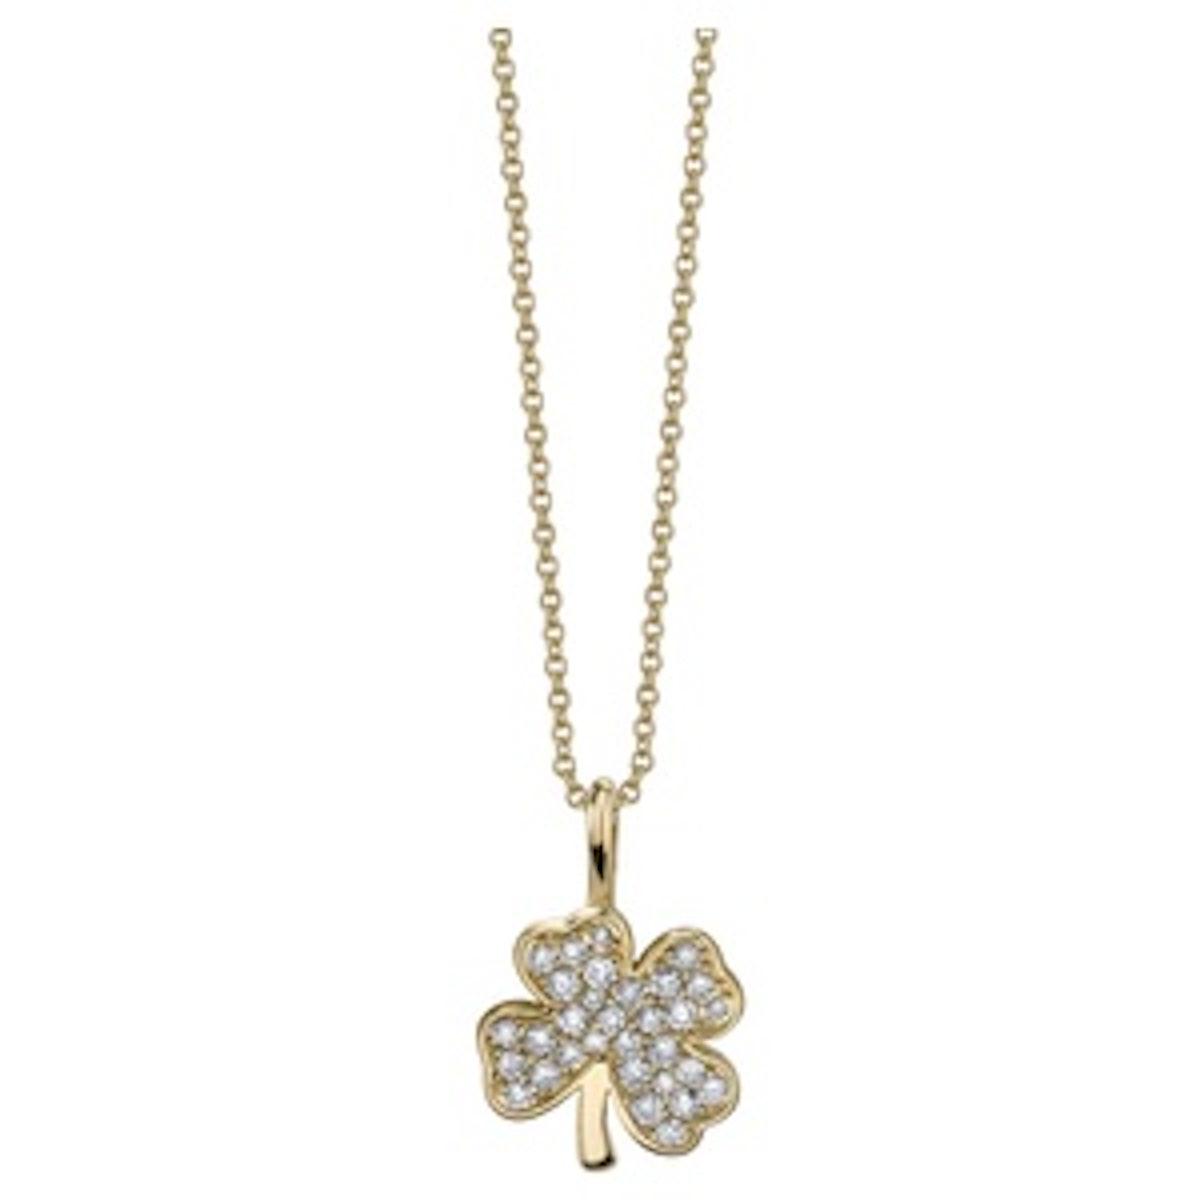 Mini Pave Clover Necklace